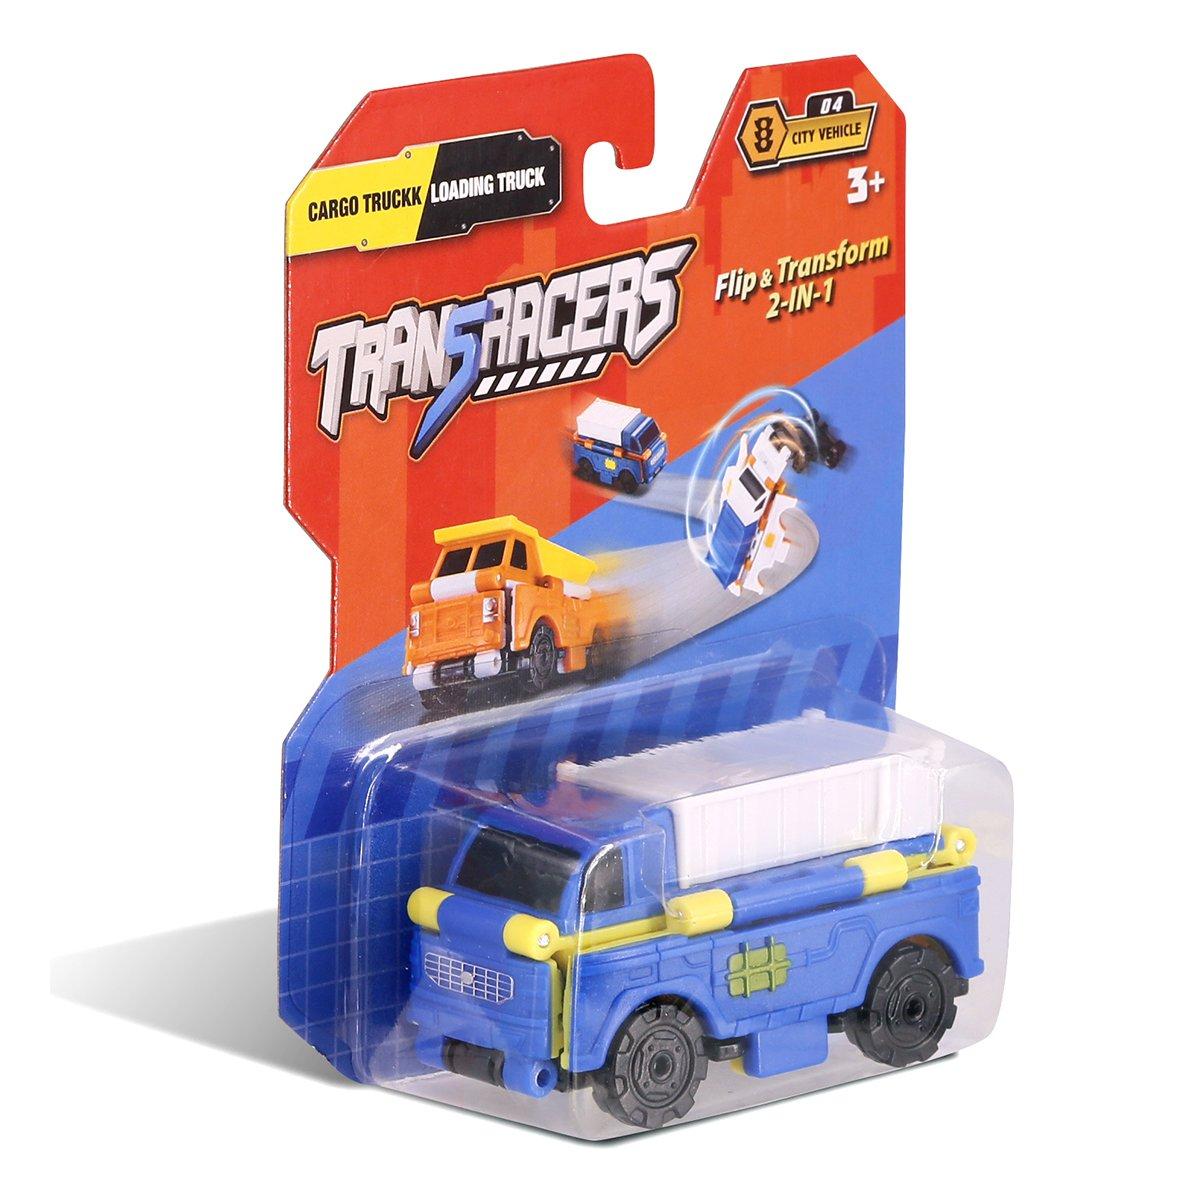 Купить Авто - мото, Машинка-трансформер TransRacers Cargo Truck&Loading Truck YW463875-12 ТМ: TransRacers